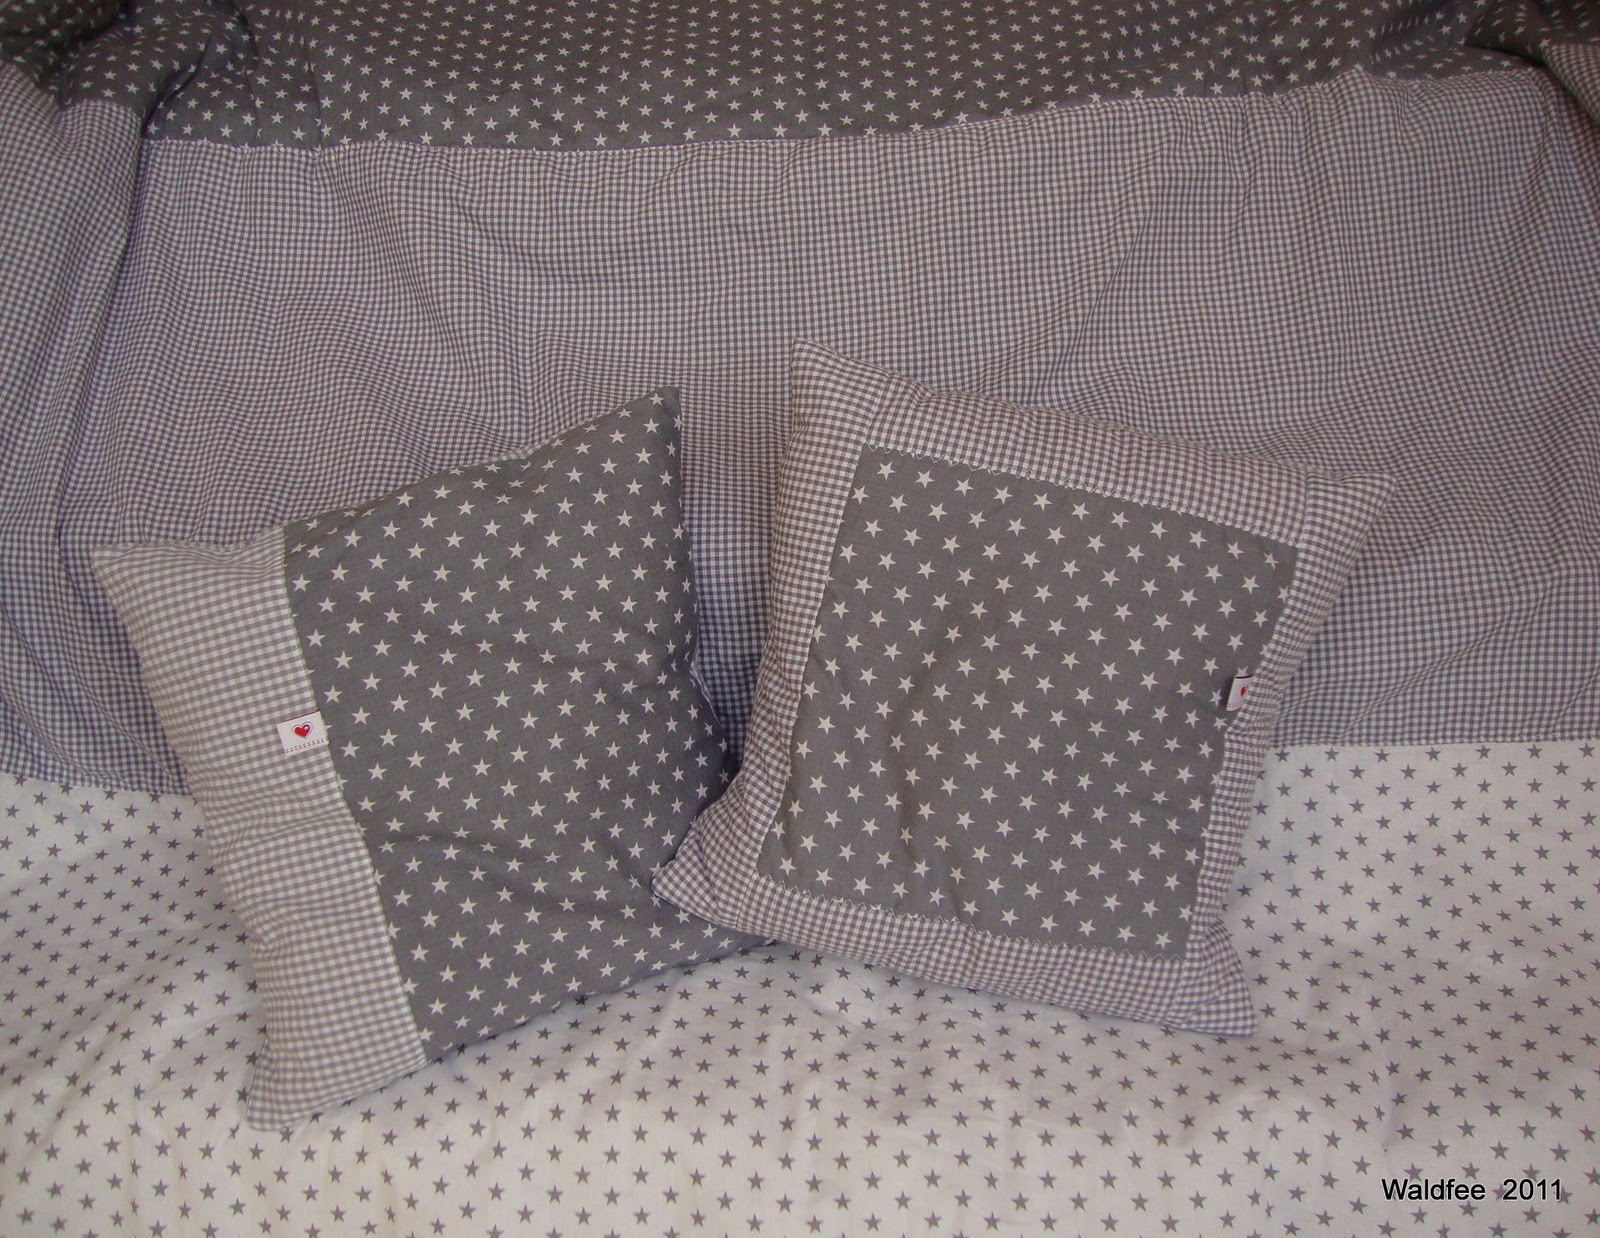 waldfee alles grau. Black Bedroom Furniture Sets. Home Design Ideas